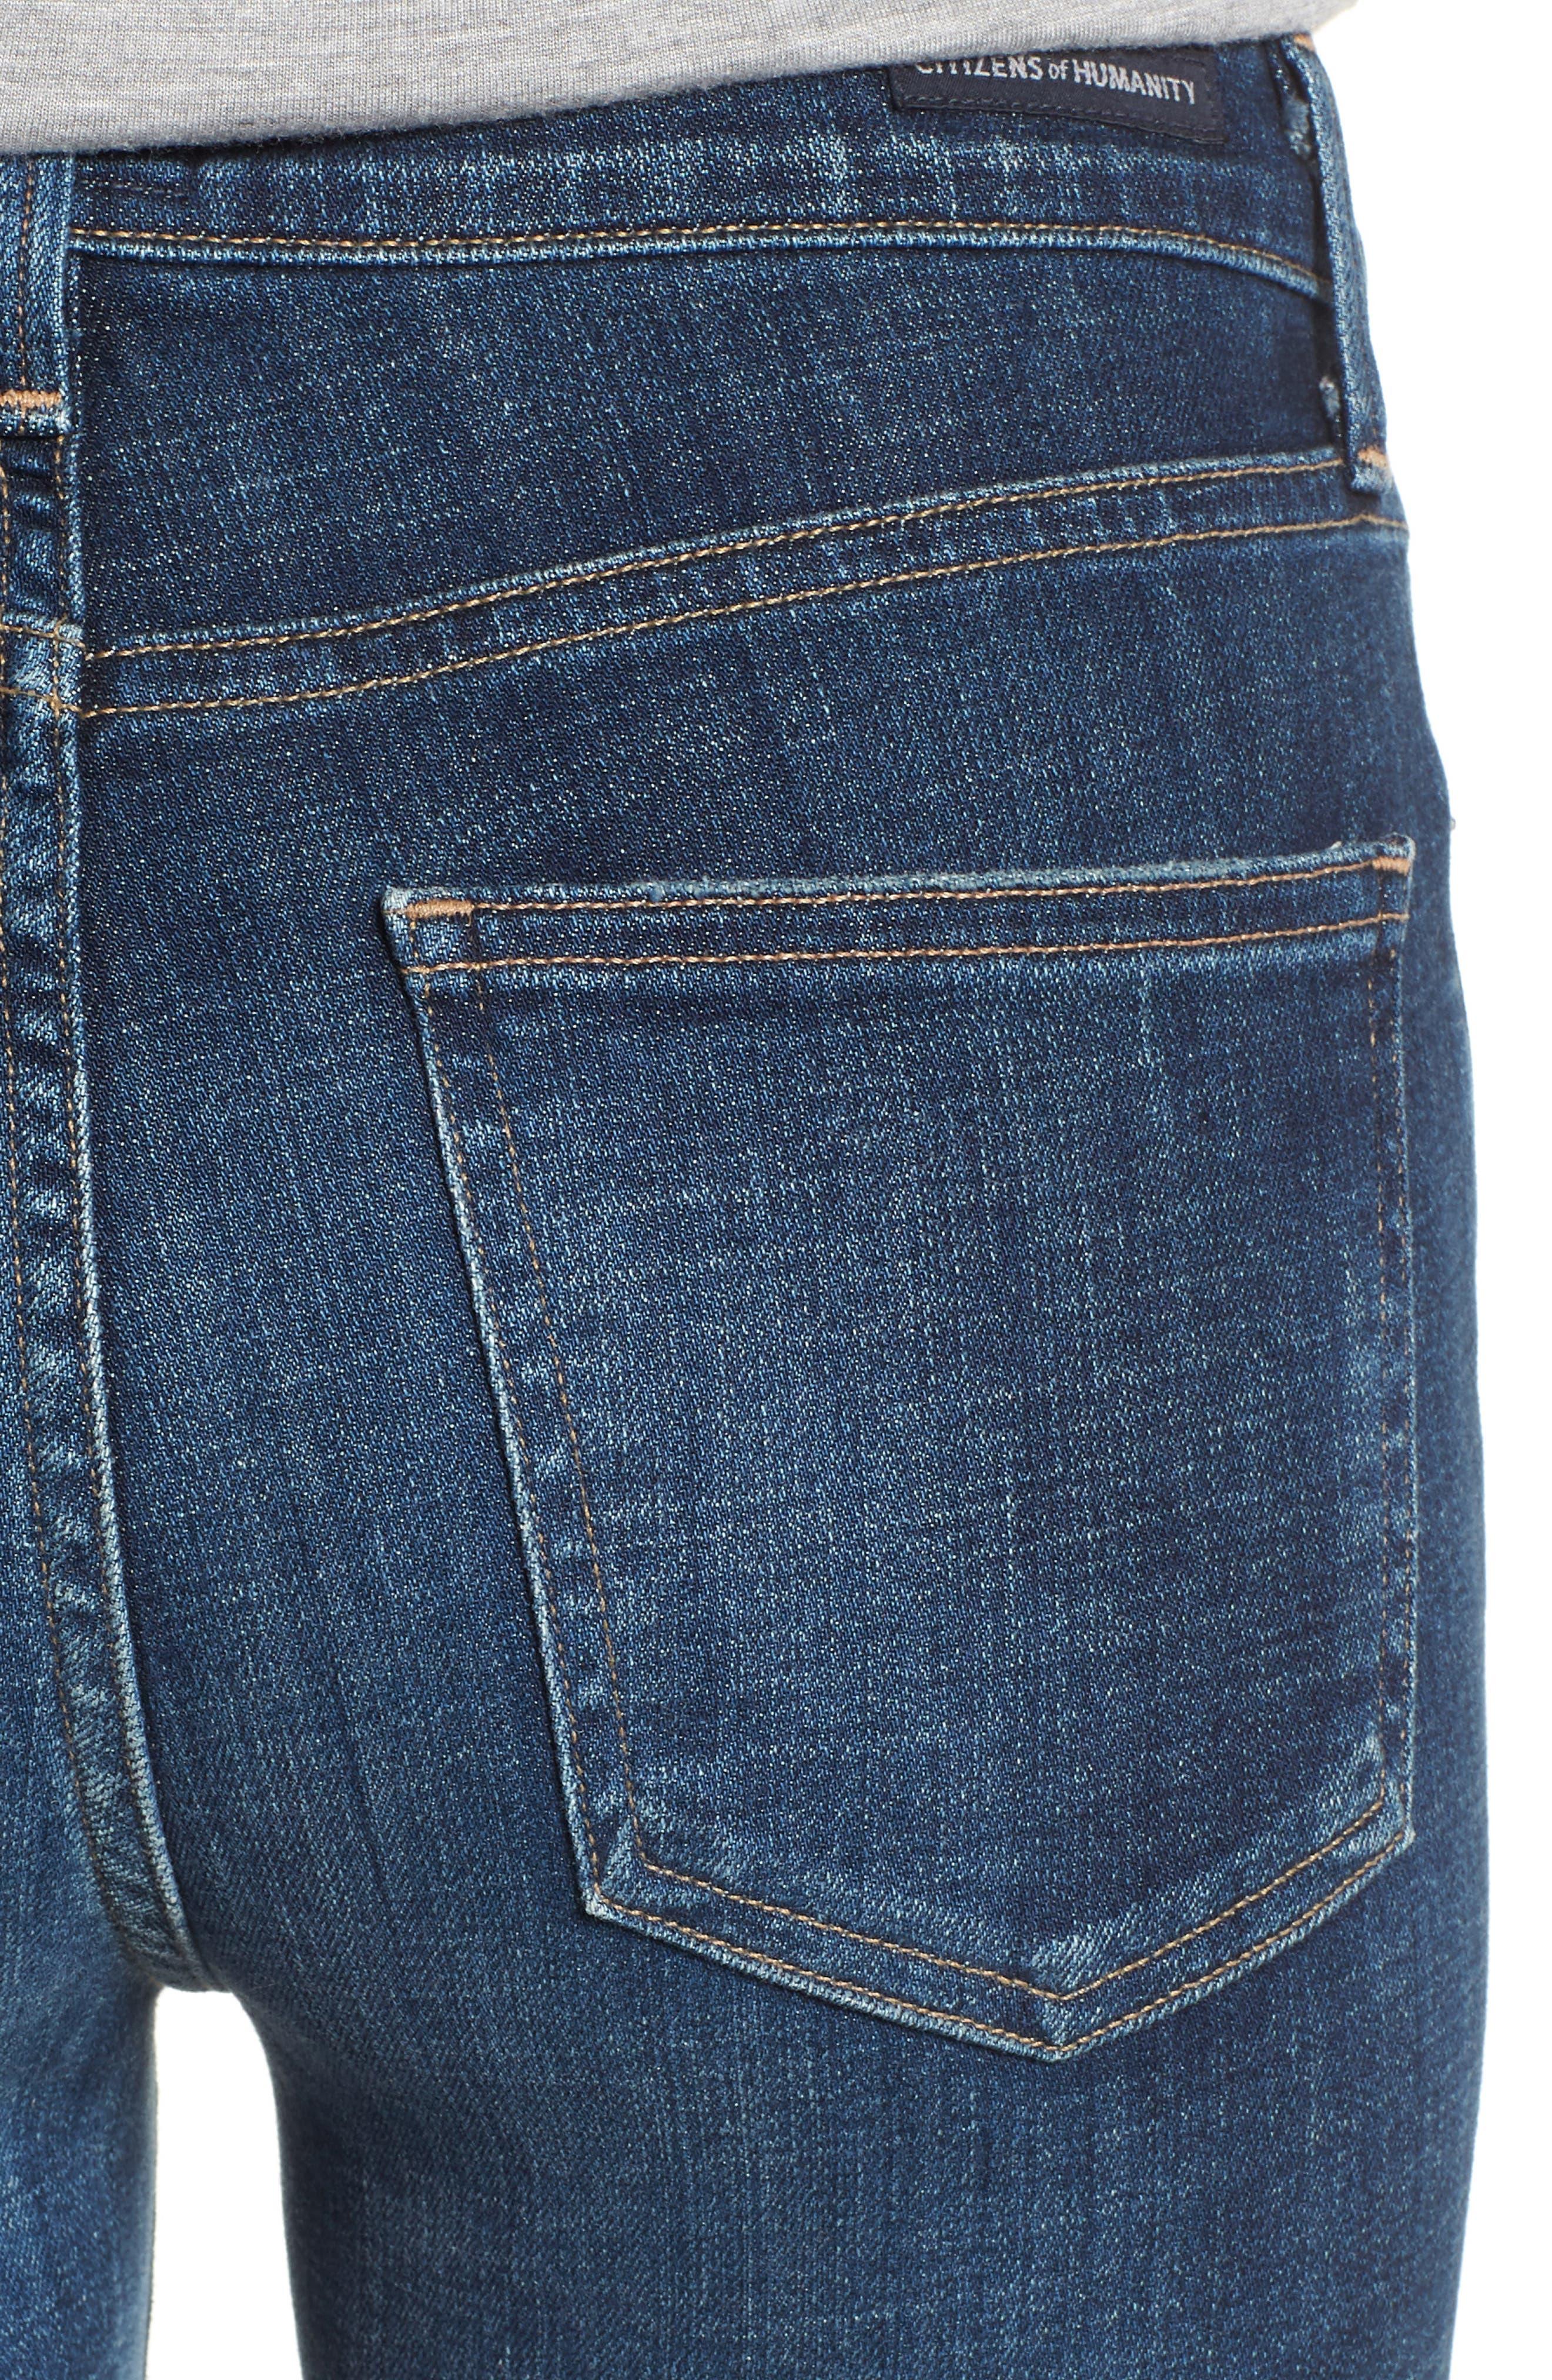 Rocket High Waist Skinny Jeans,                             Alternate thumbnail 4, color,                             428